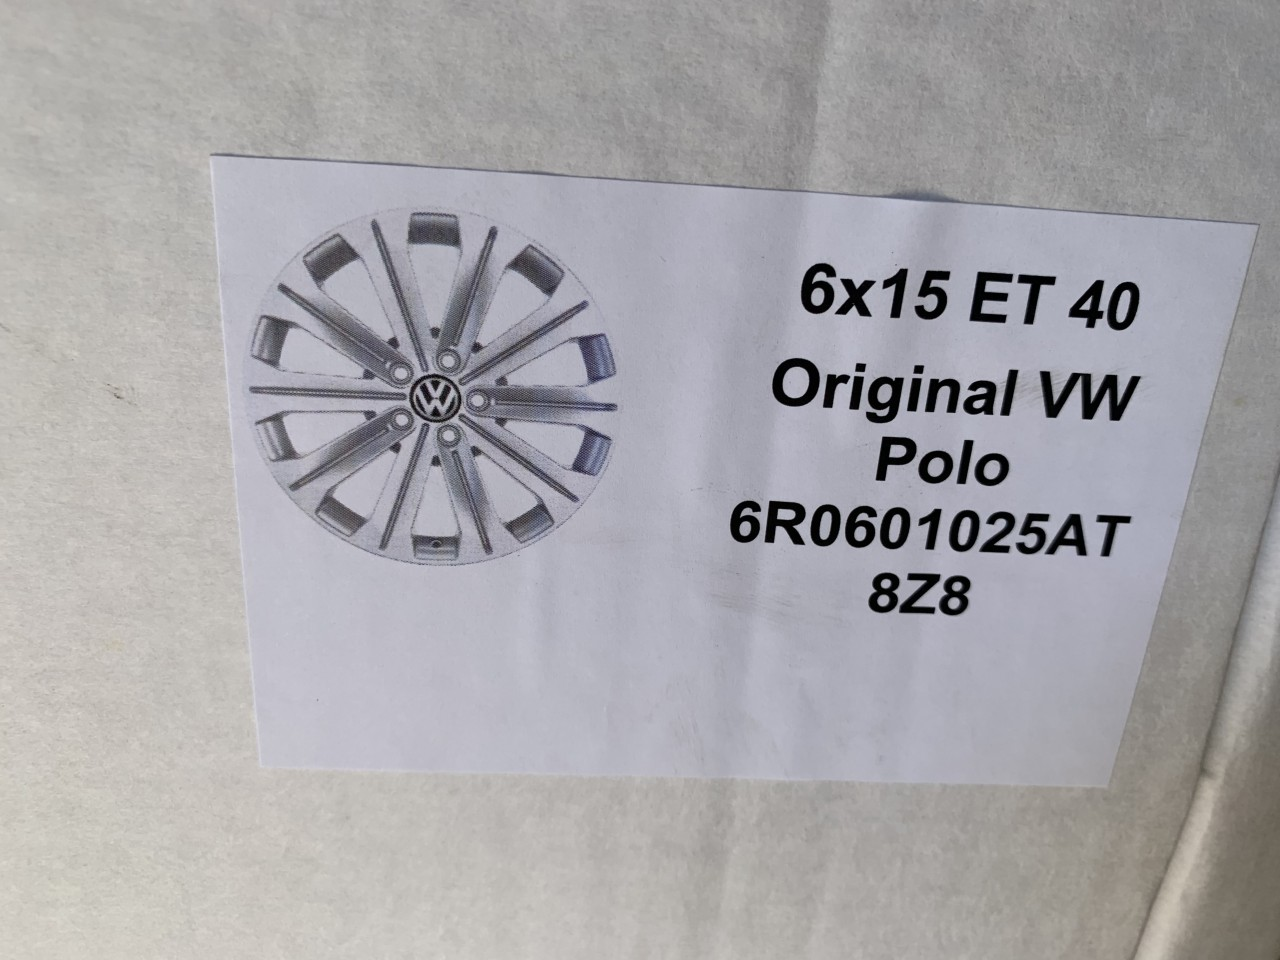 "Vând jante originale Volkswagen polo pe 15"" noi"